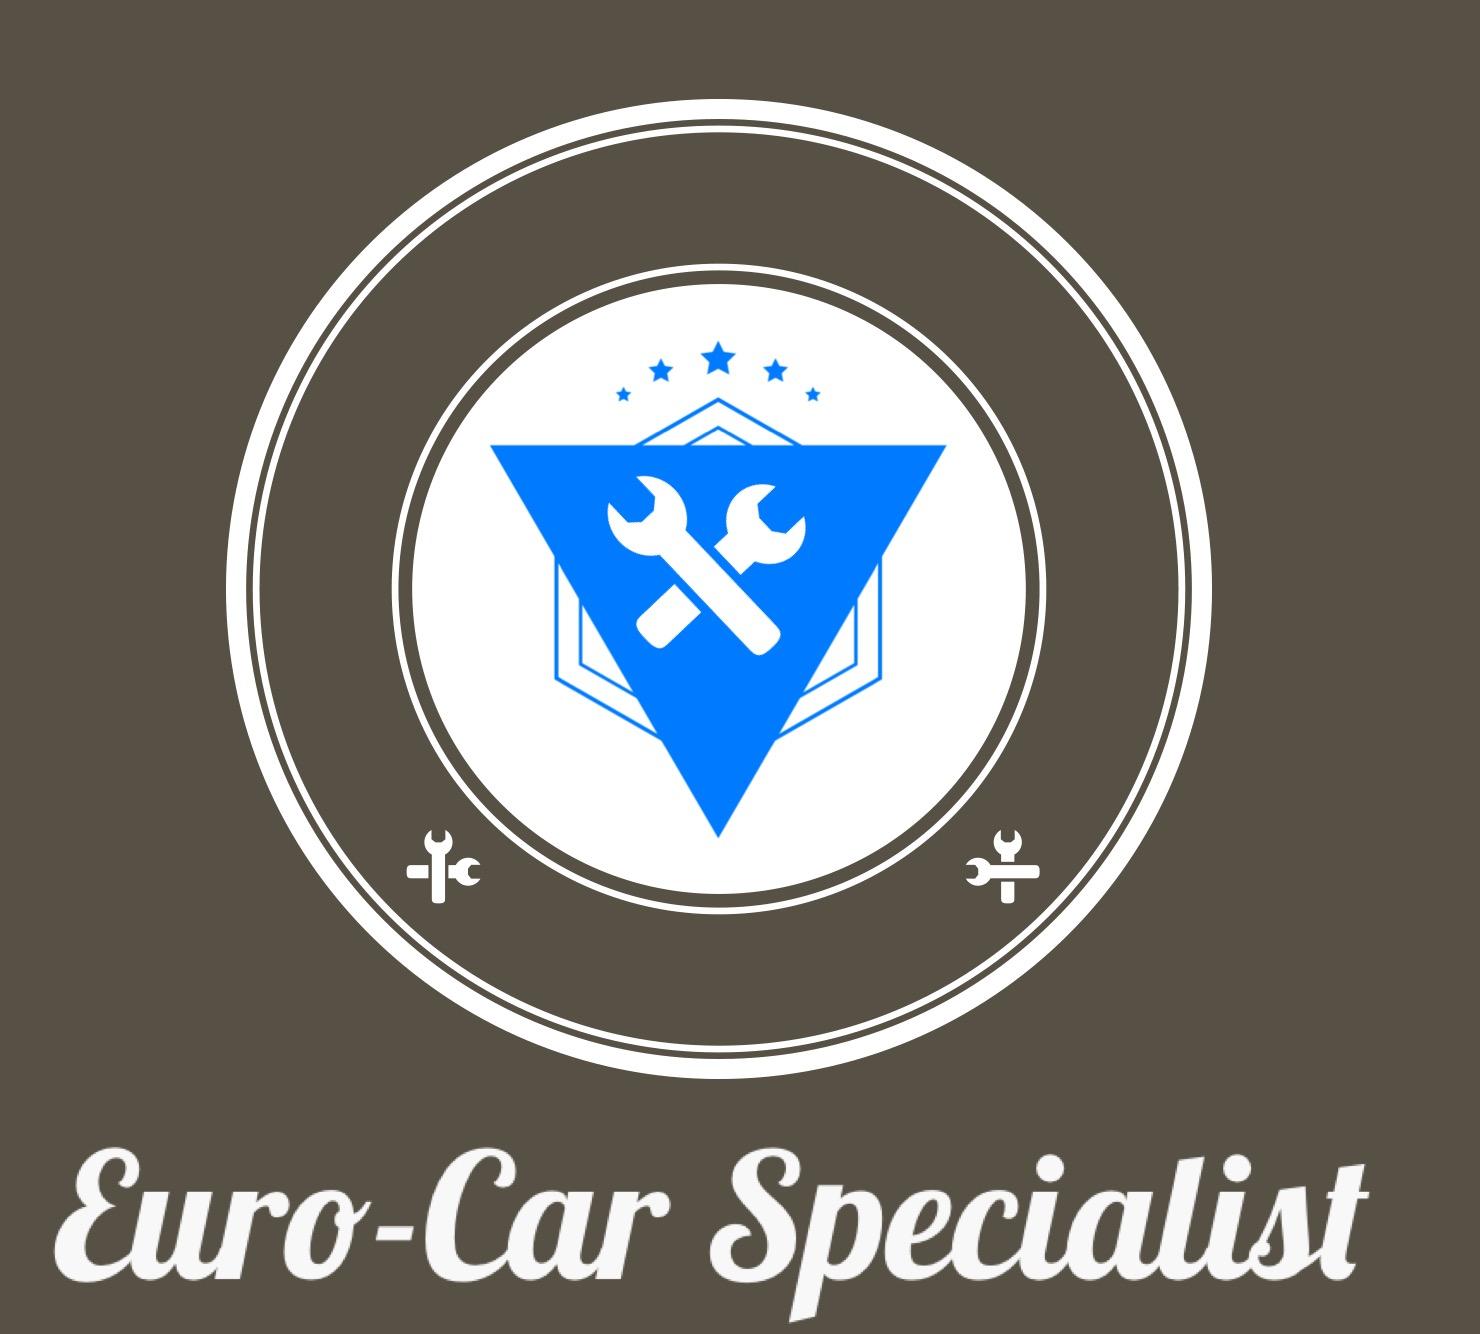 Vertu Specialist Cars Dealership: Euro Car Specialist / Volvo Mechanics, Your Dealer Alternative